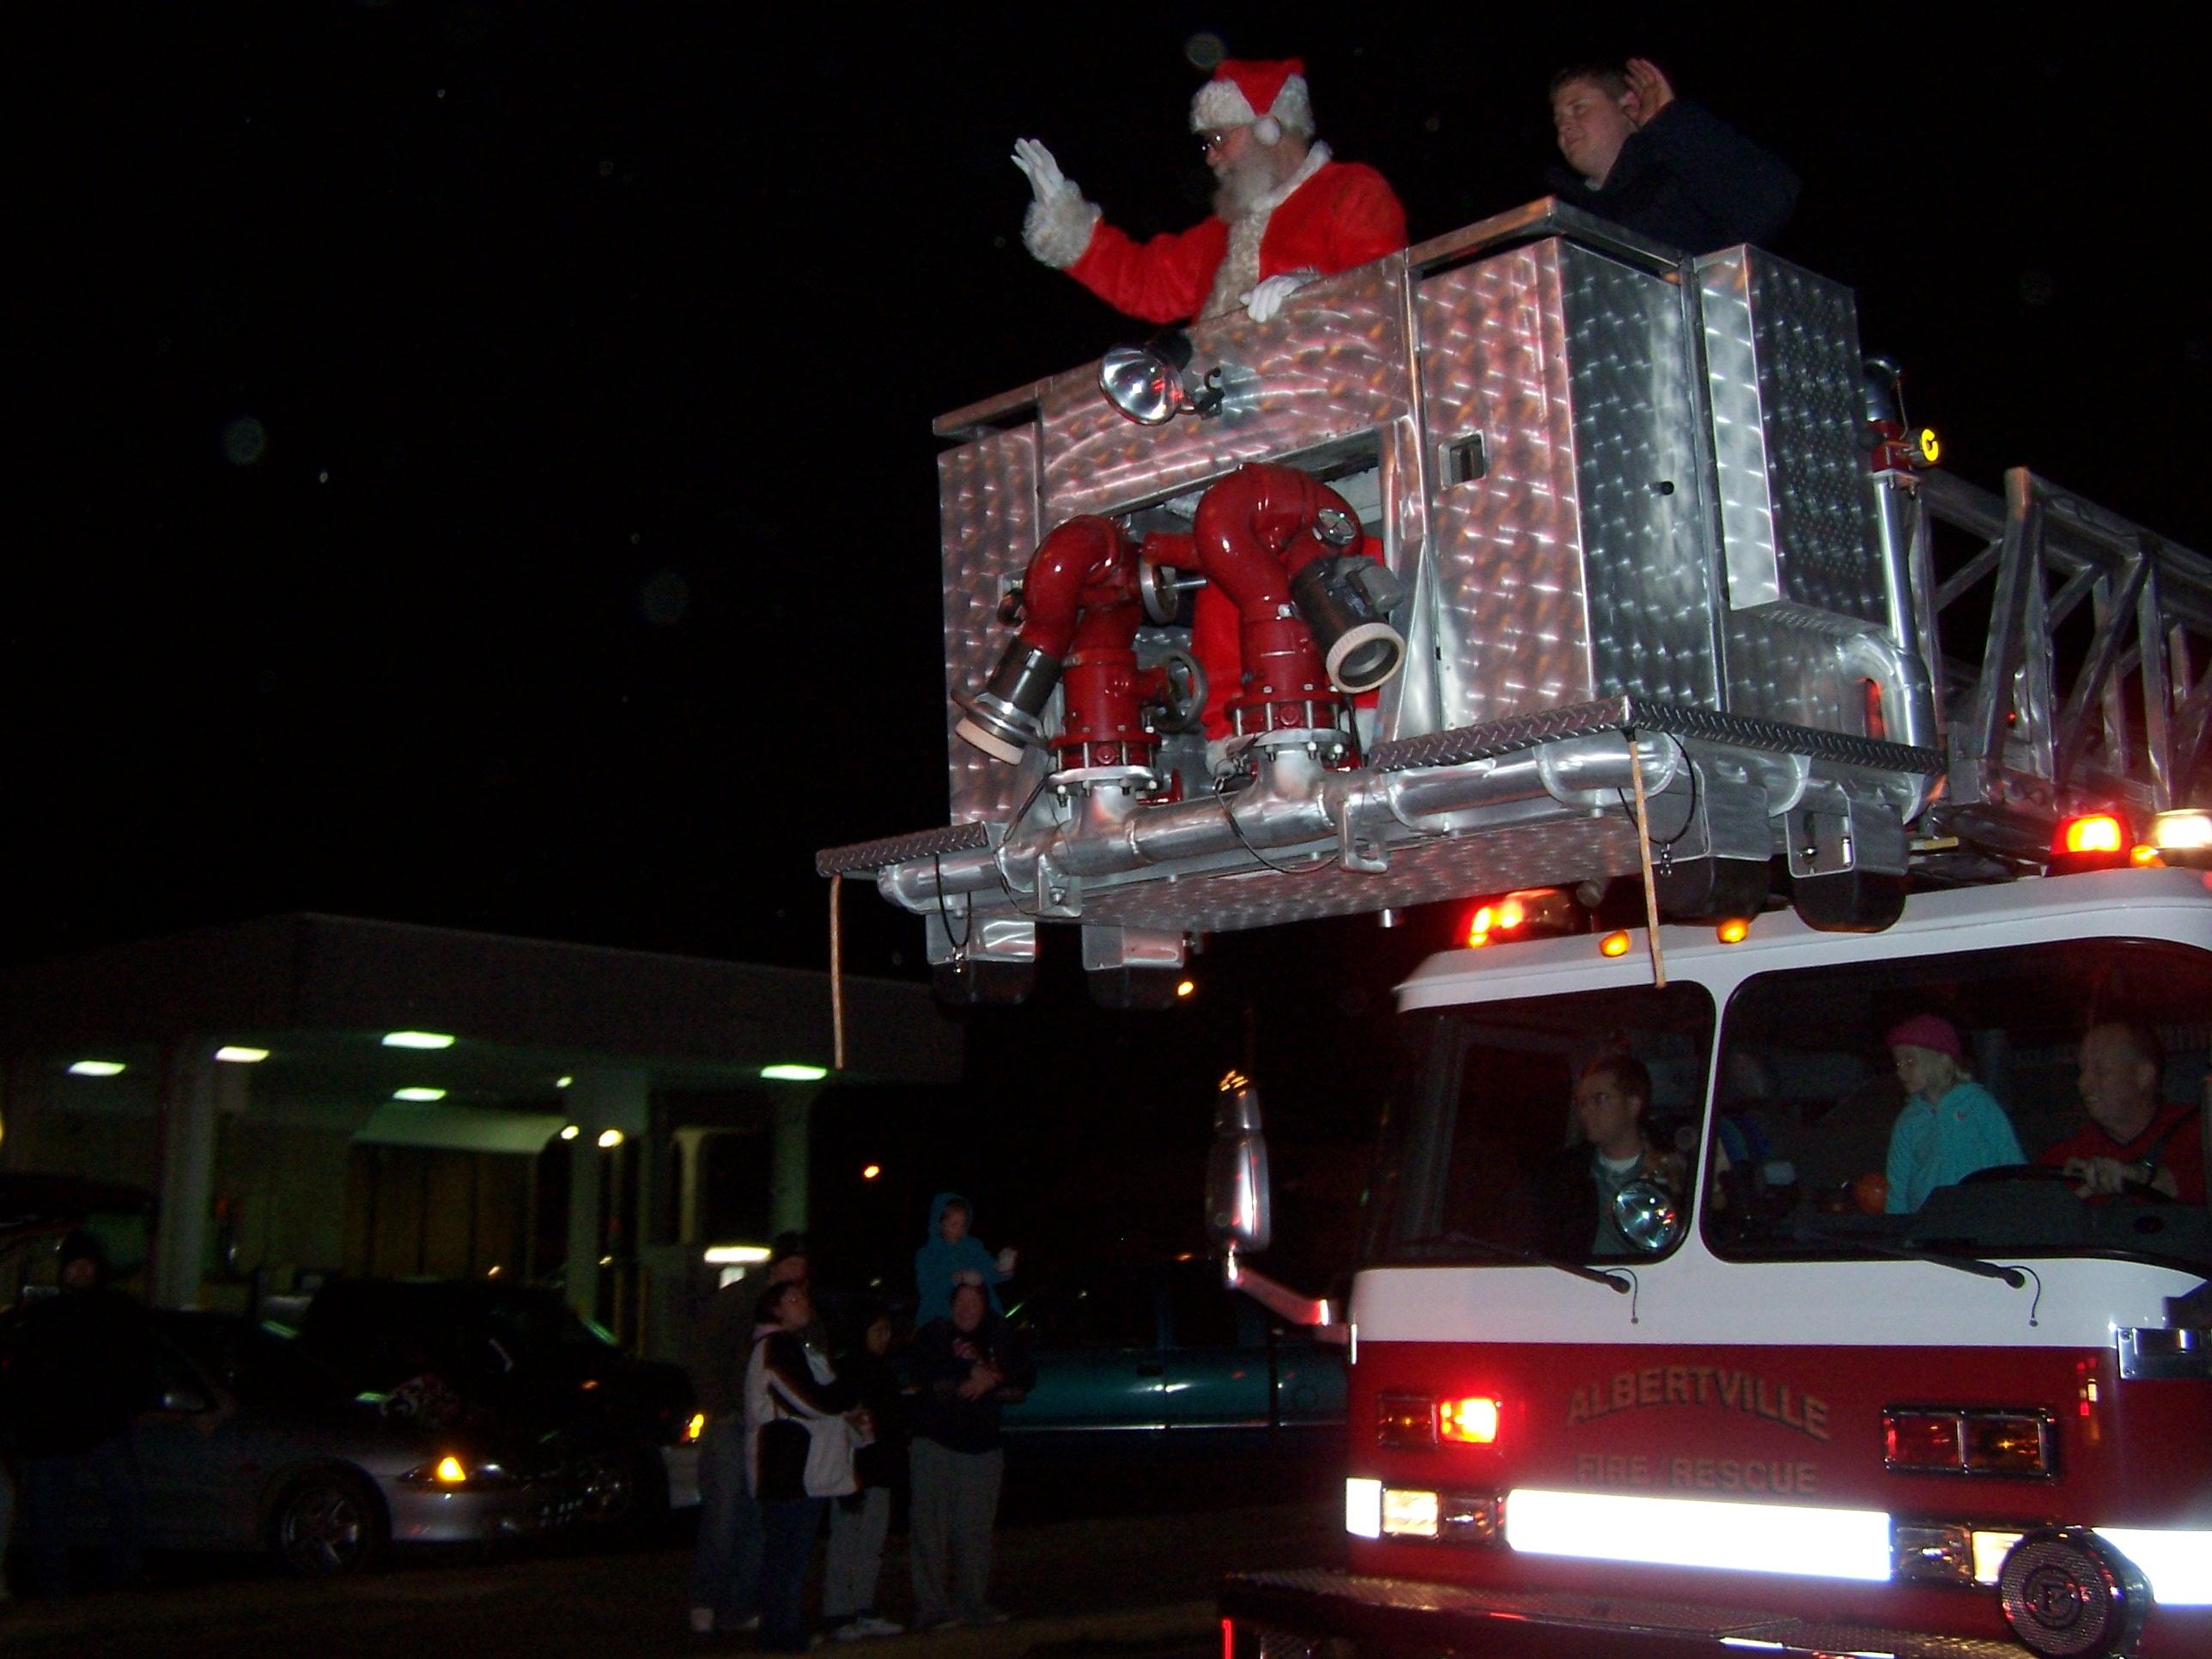 Albertville Christmas Parade